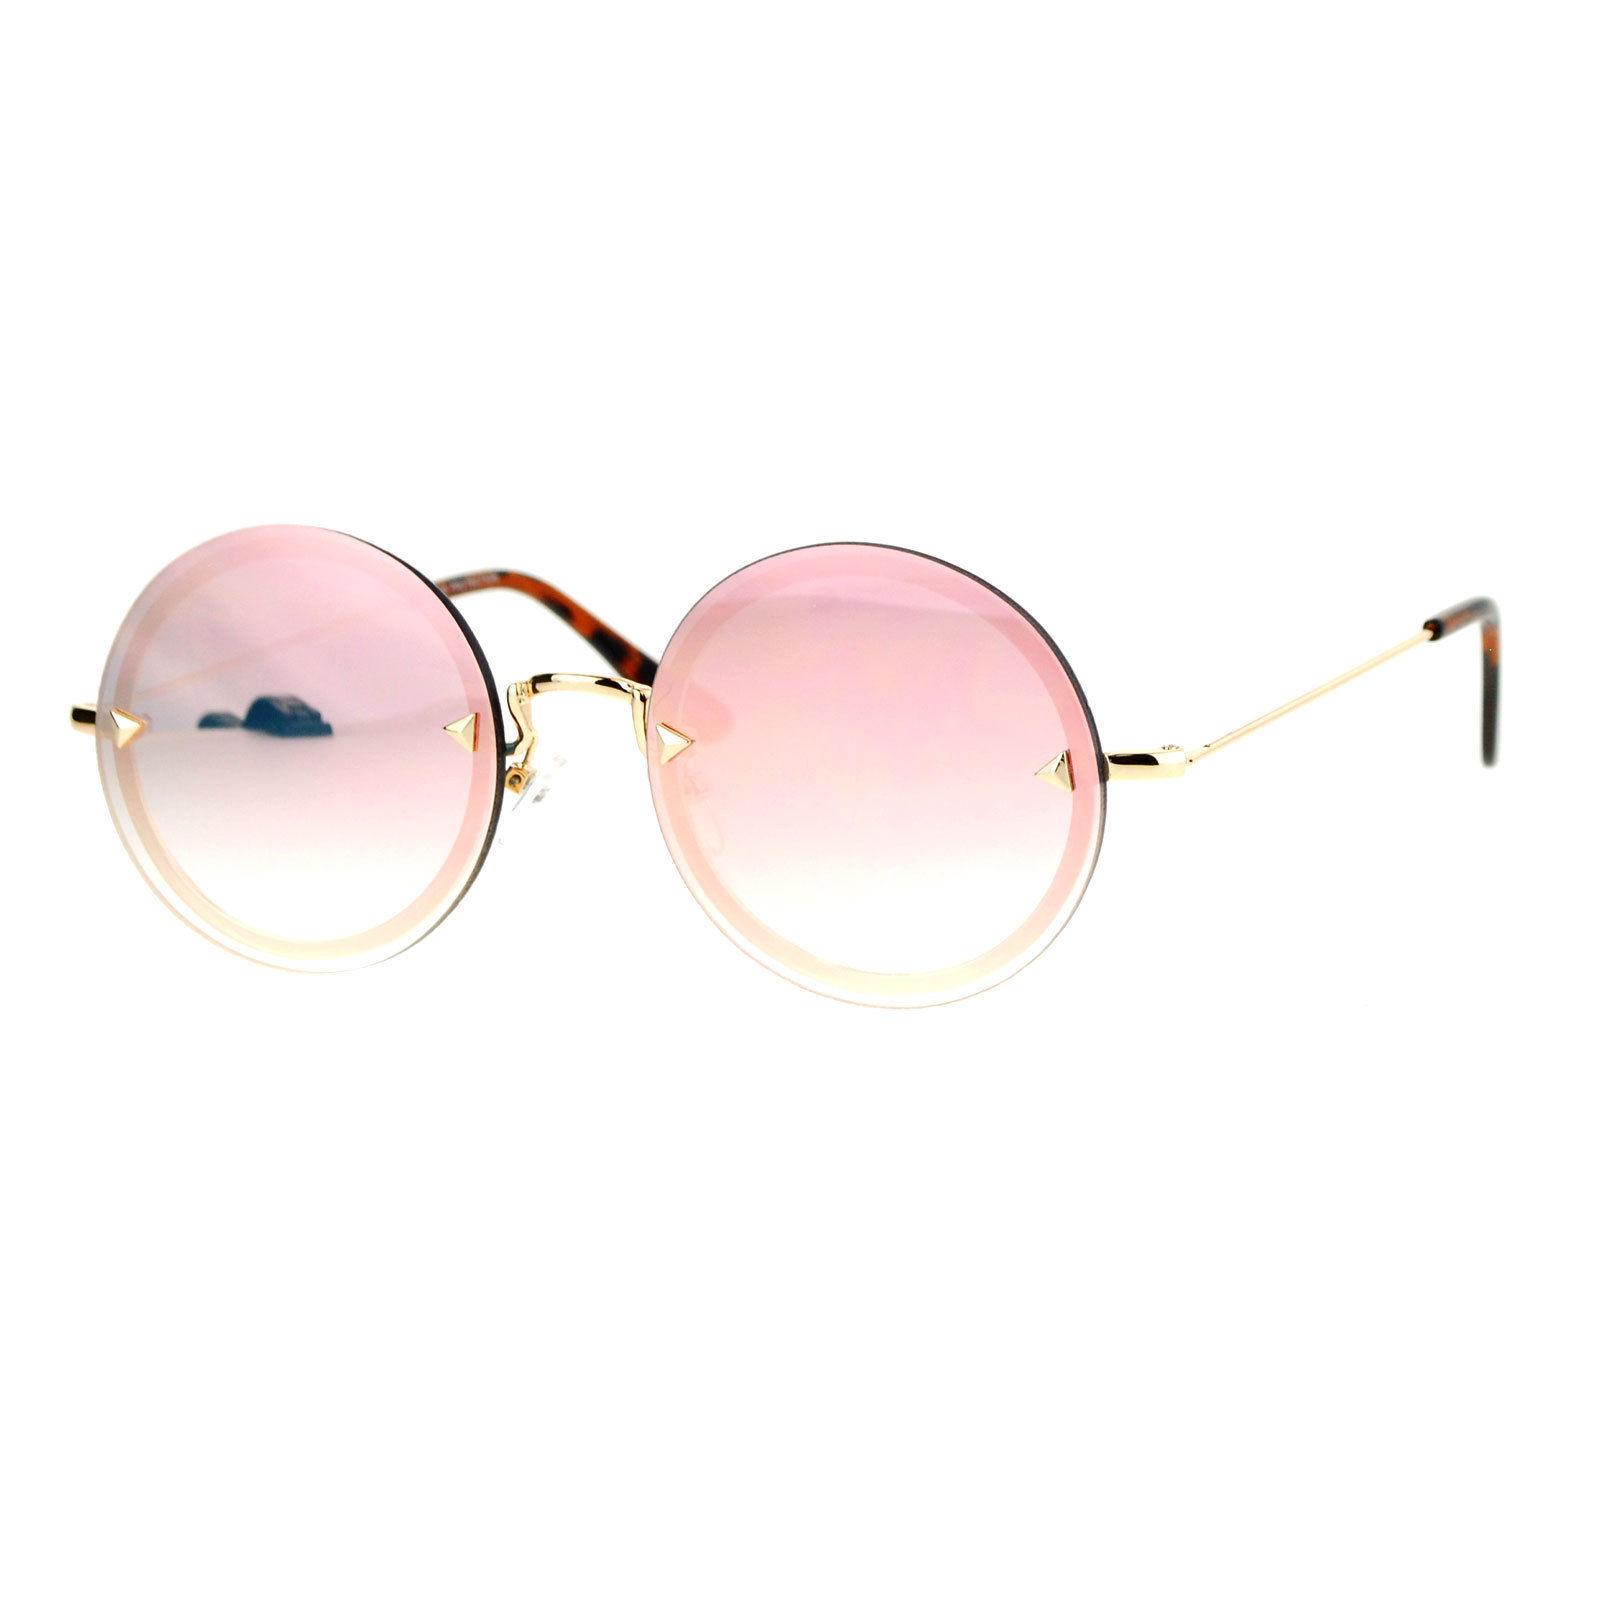 Round Circle Frame Sunglasses Womens Full Mirror Lens Rear Rim Fashion